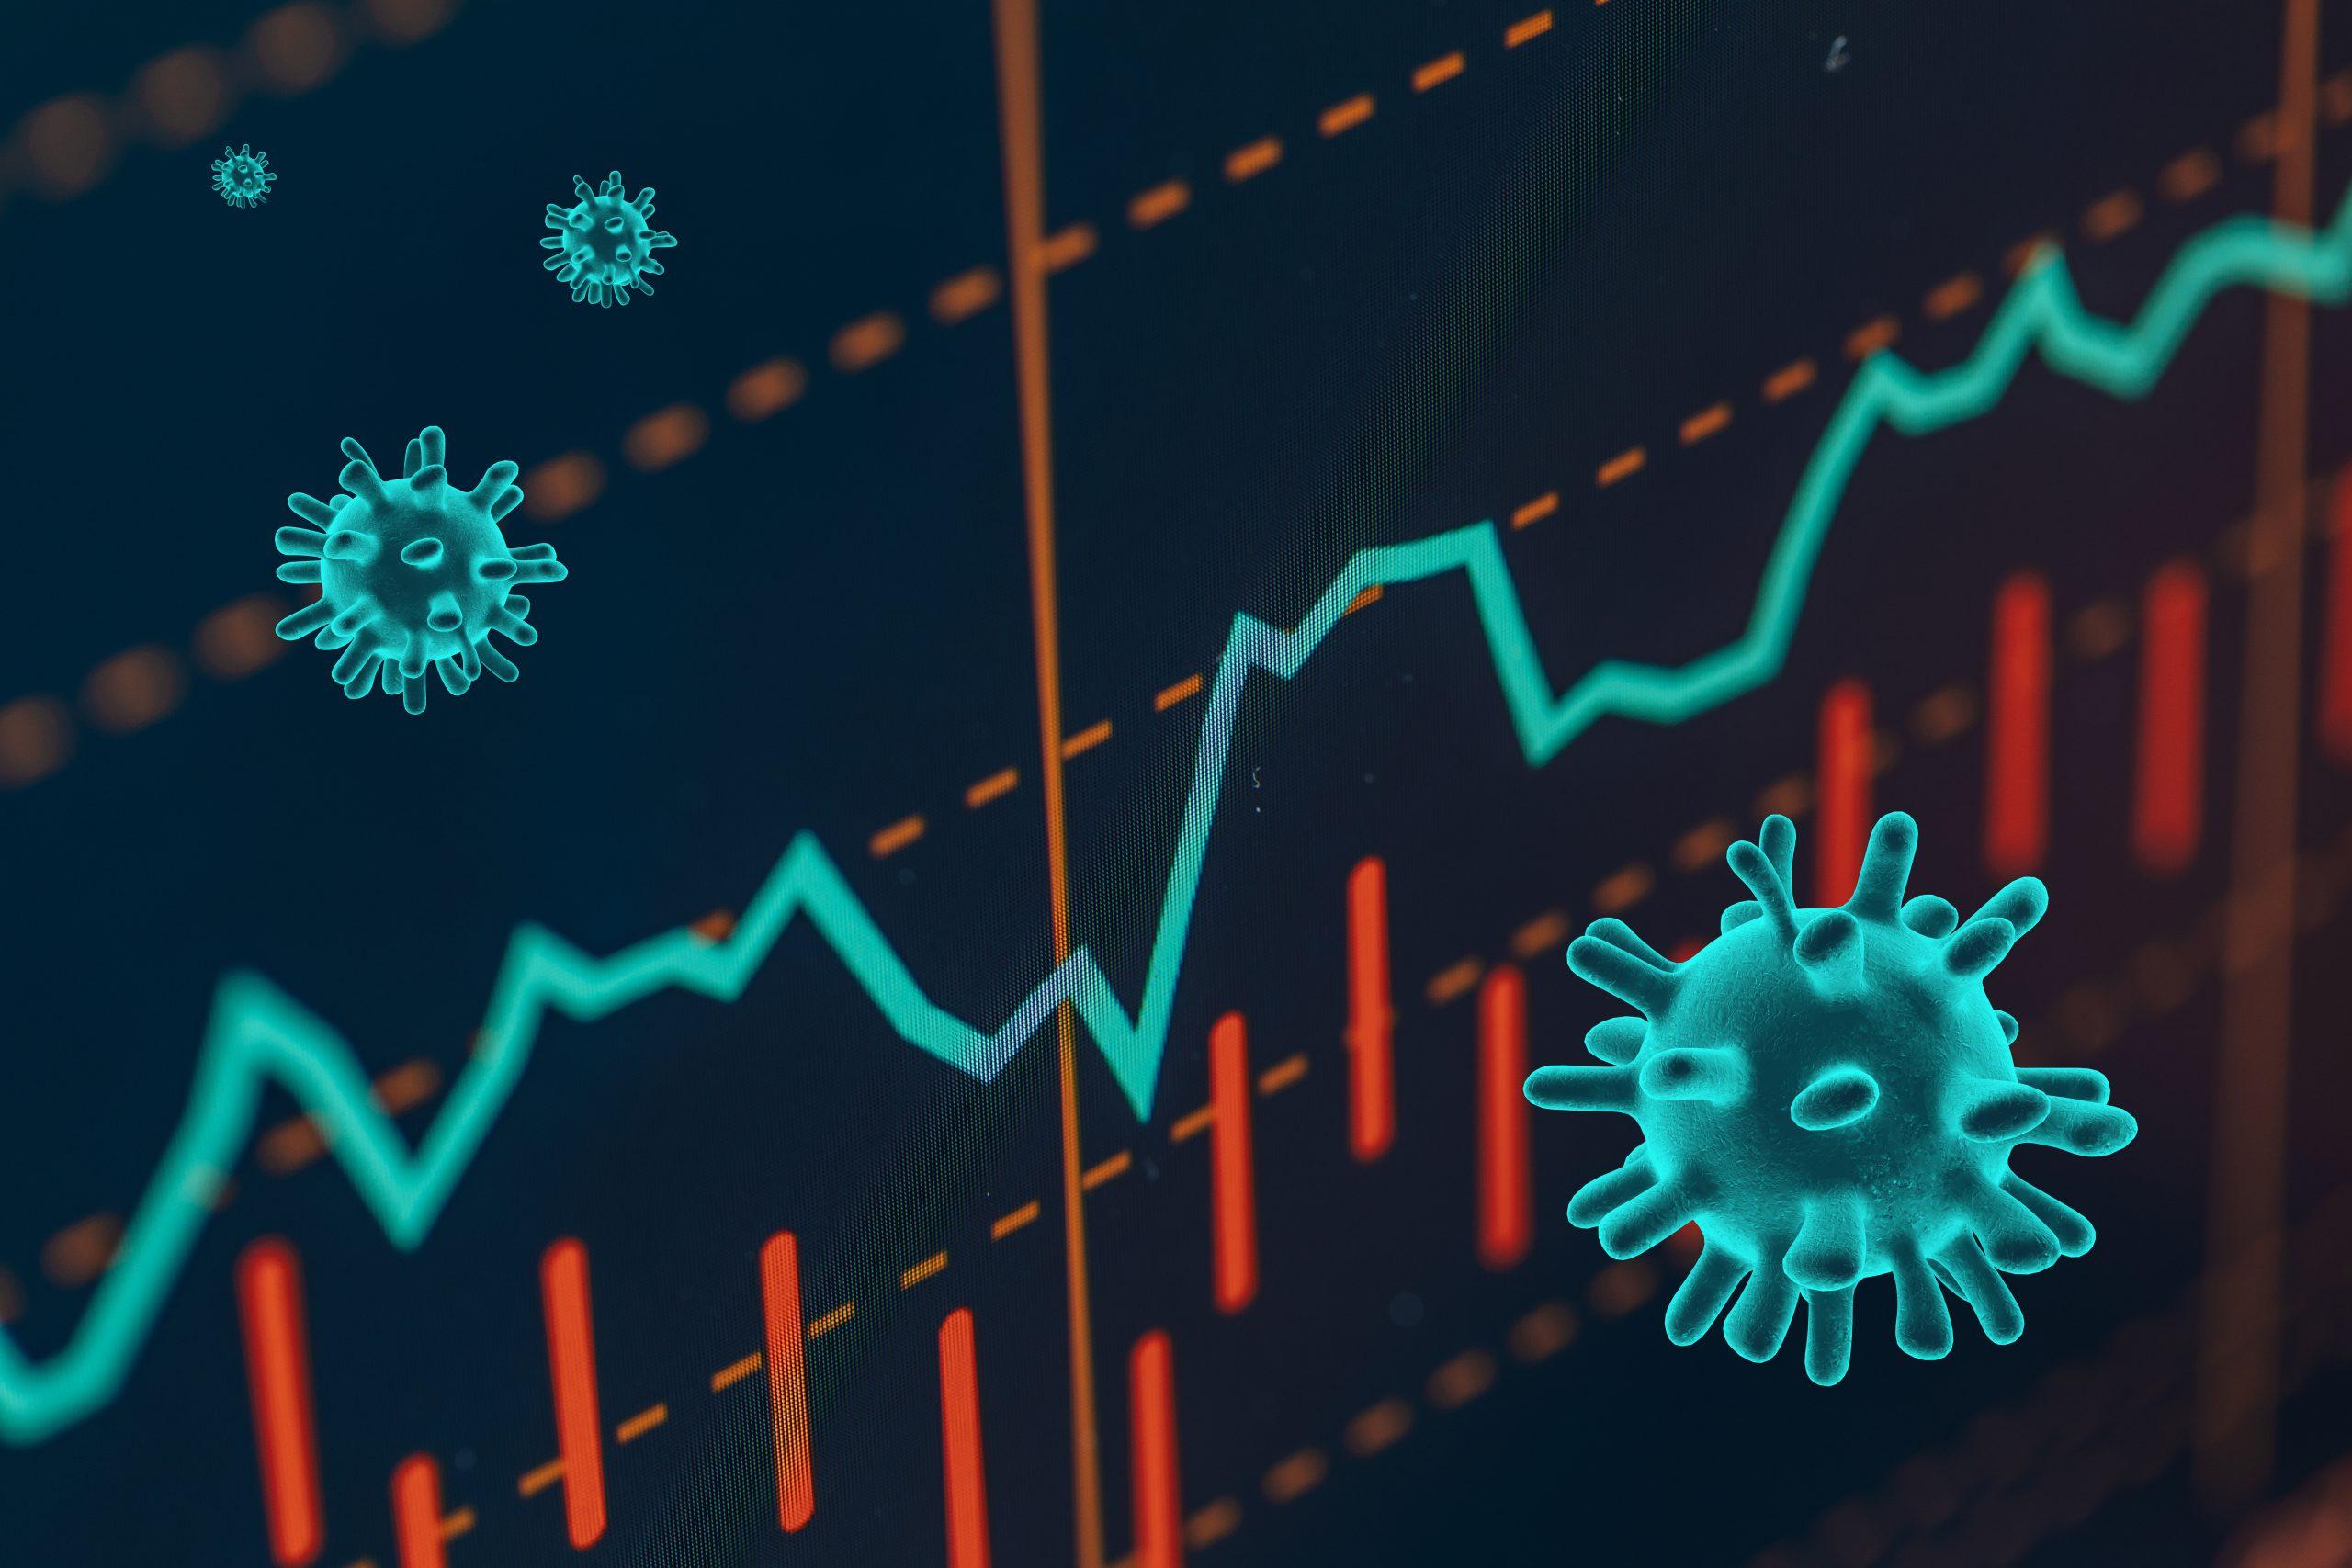 Graphs representing the stock market crash caused by the Coronavirus